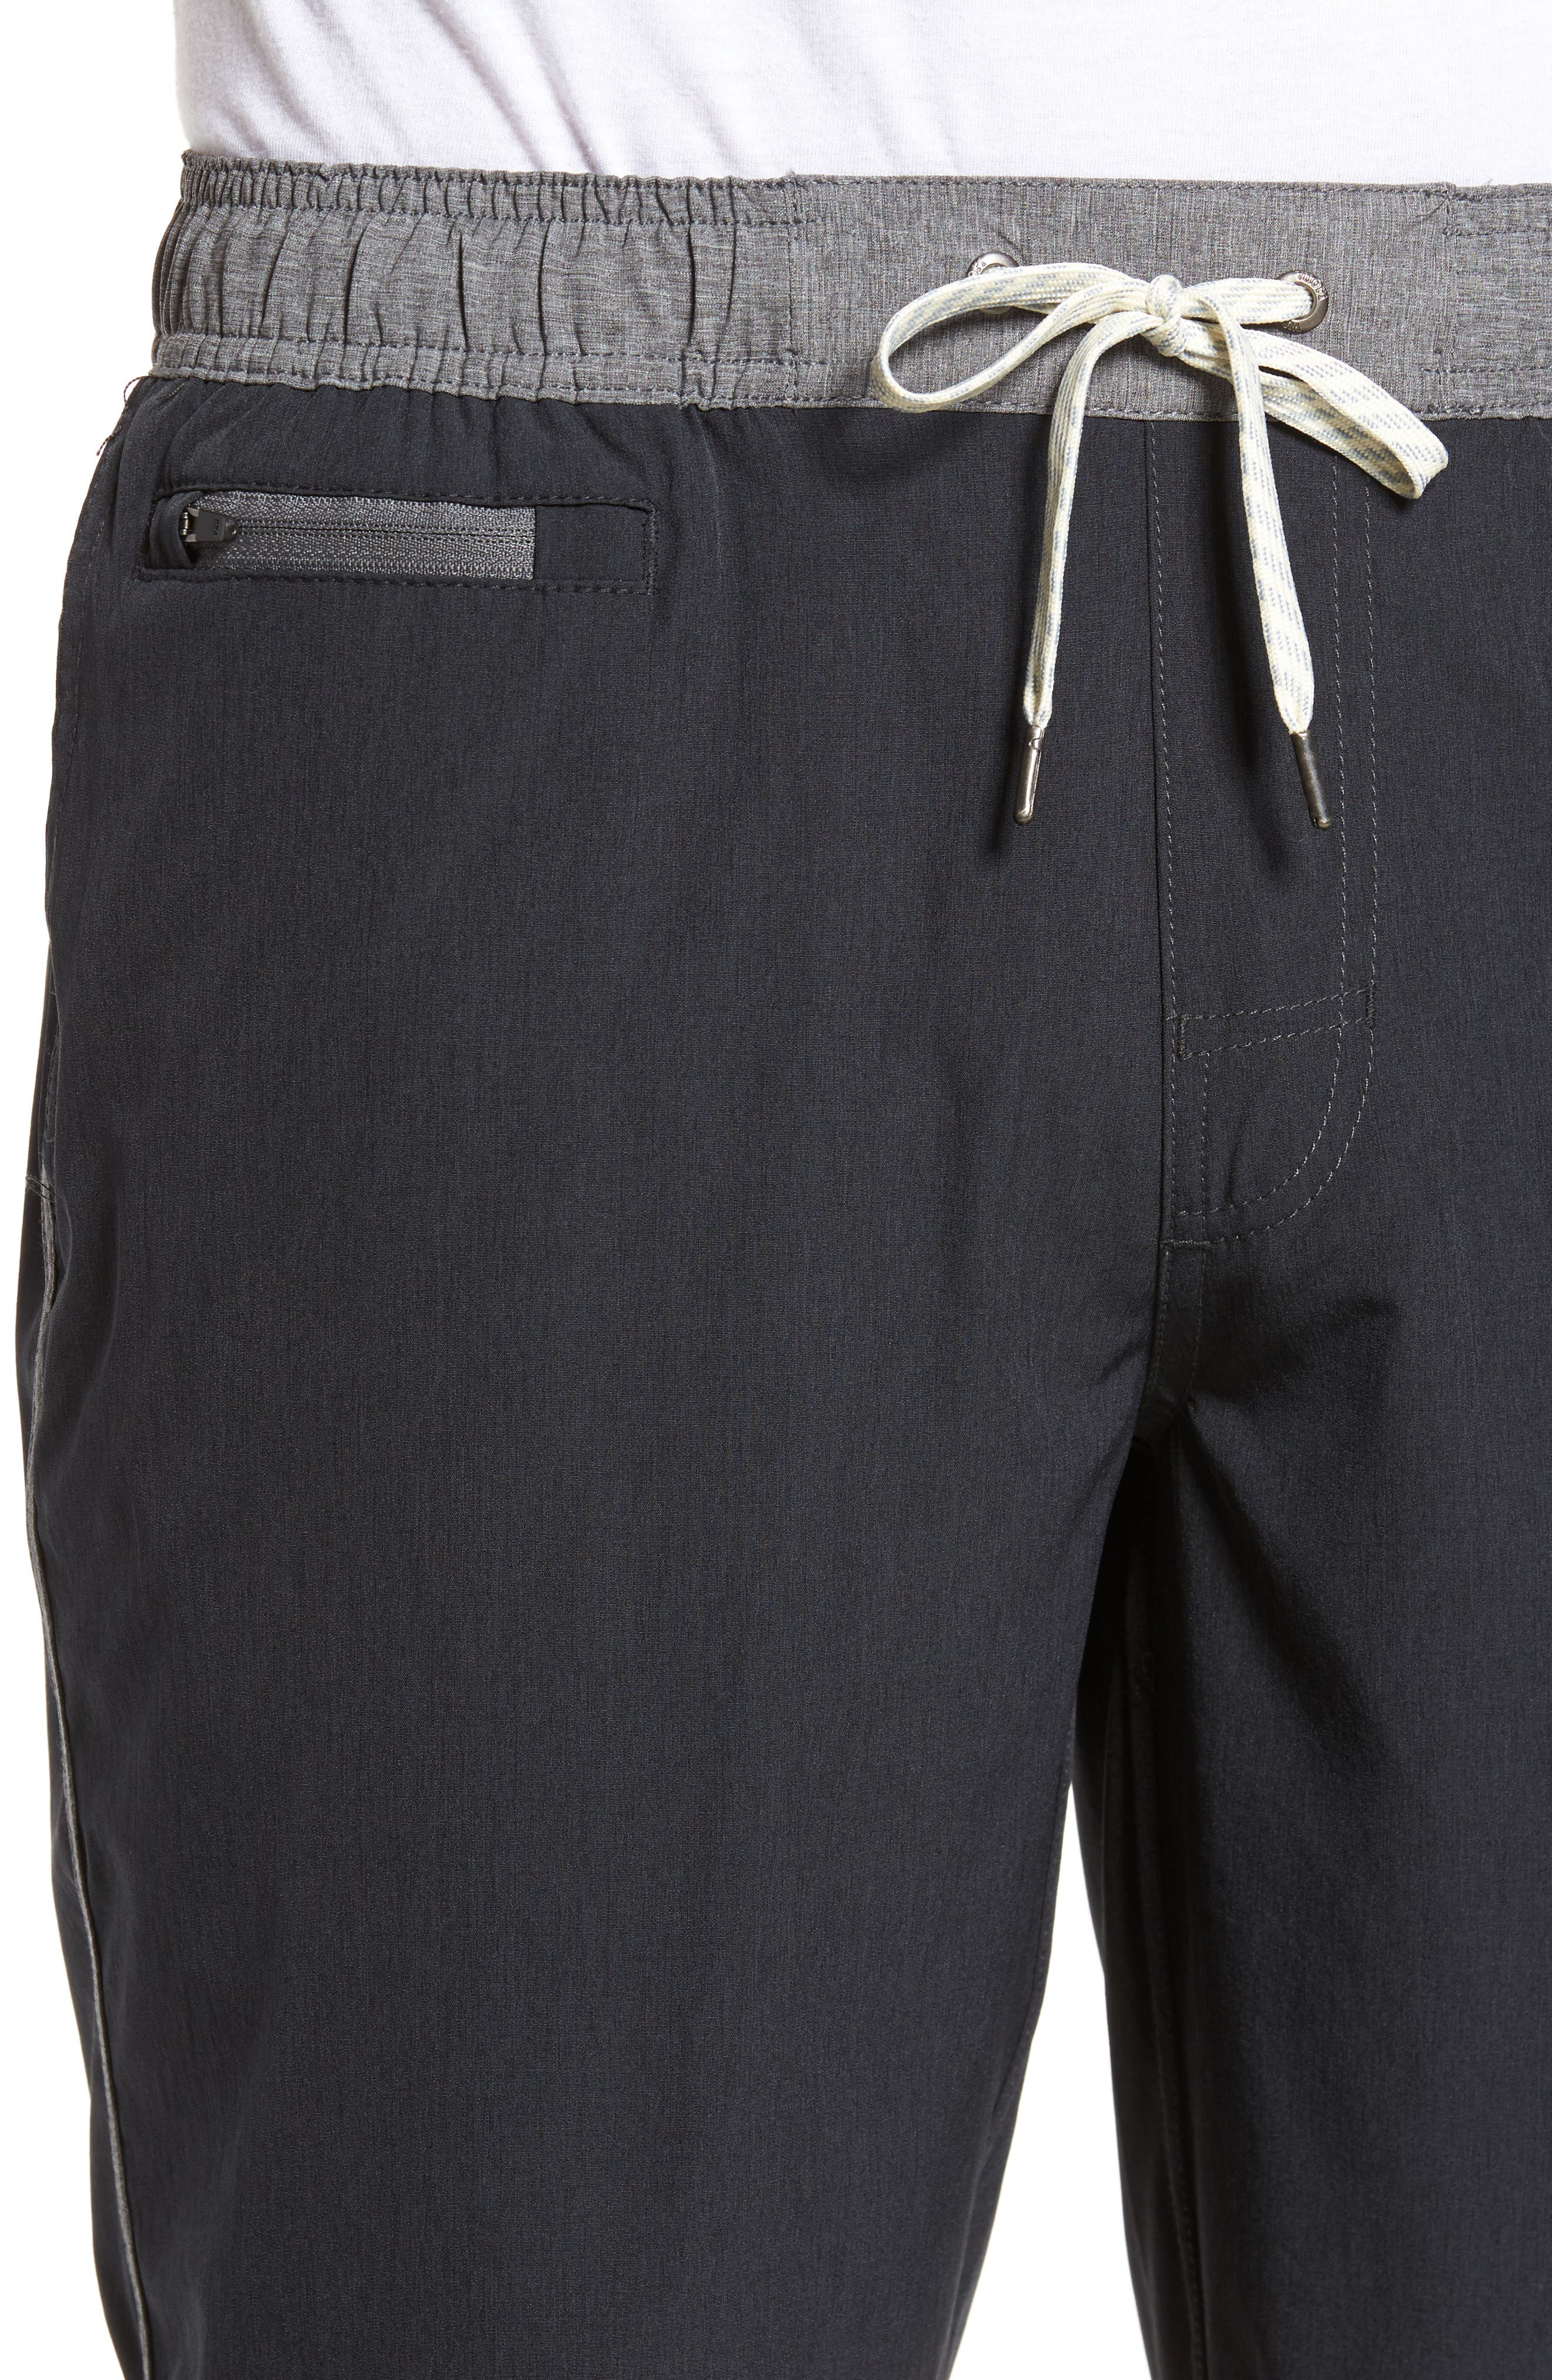 Banks Performance Hybrid Shorts,                             Alternate thumbnail 4, color,                             Black Linen Texture